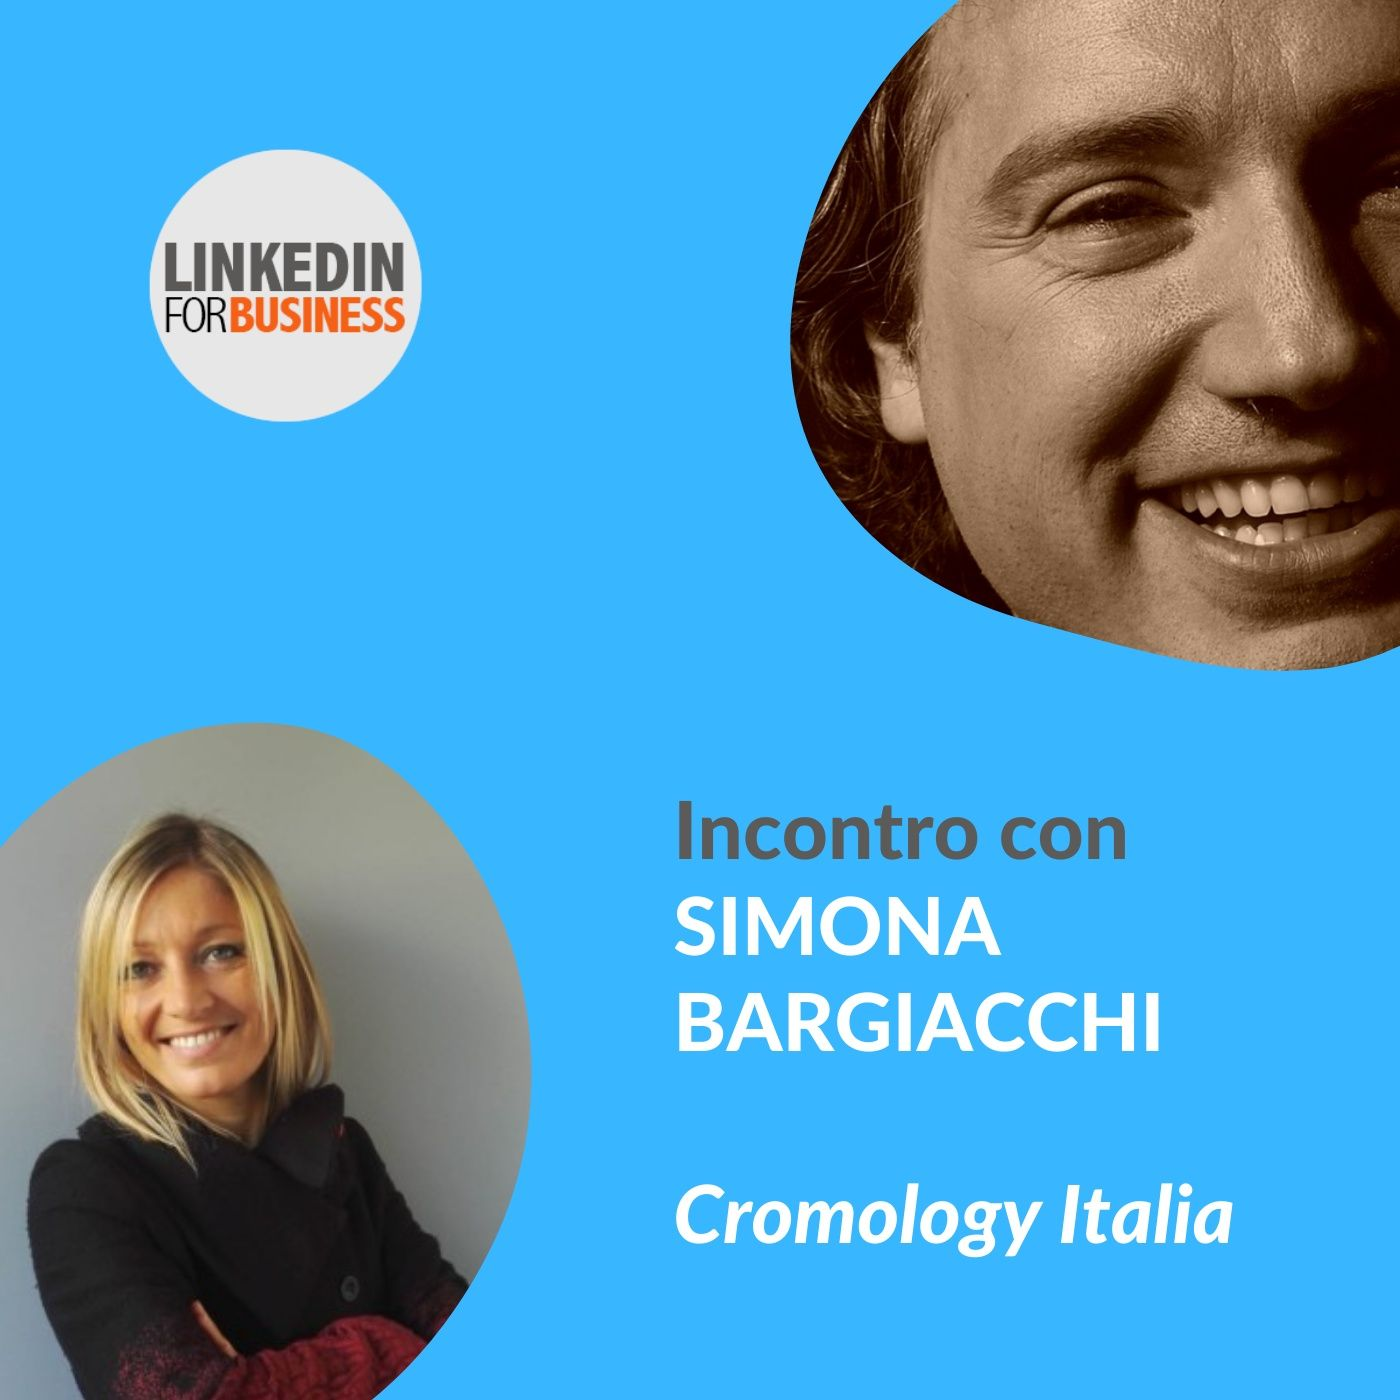 130 - LinkedInForBusiness incontra Simona Bargiacchi di Cromology Italia